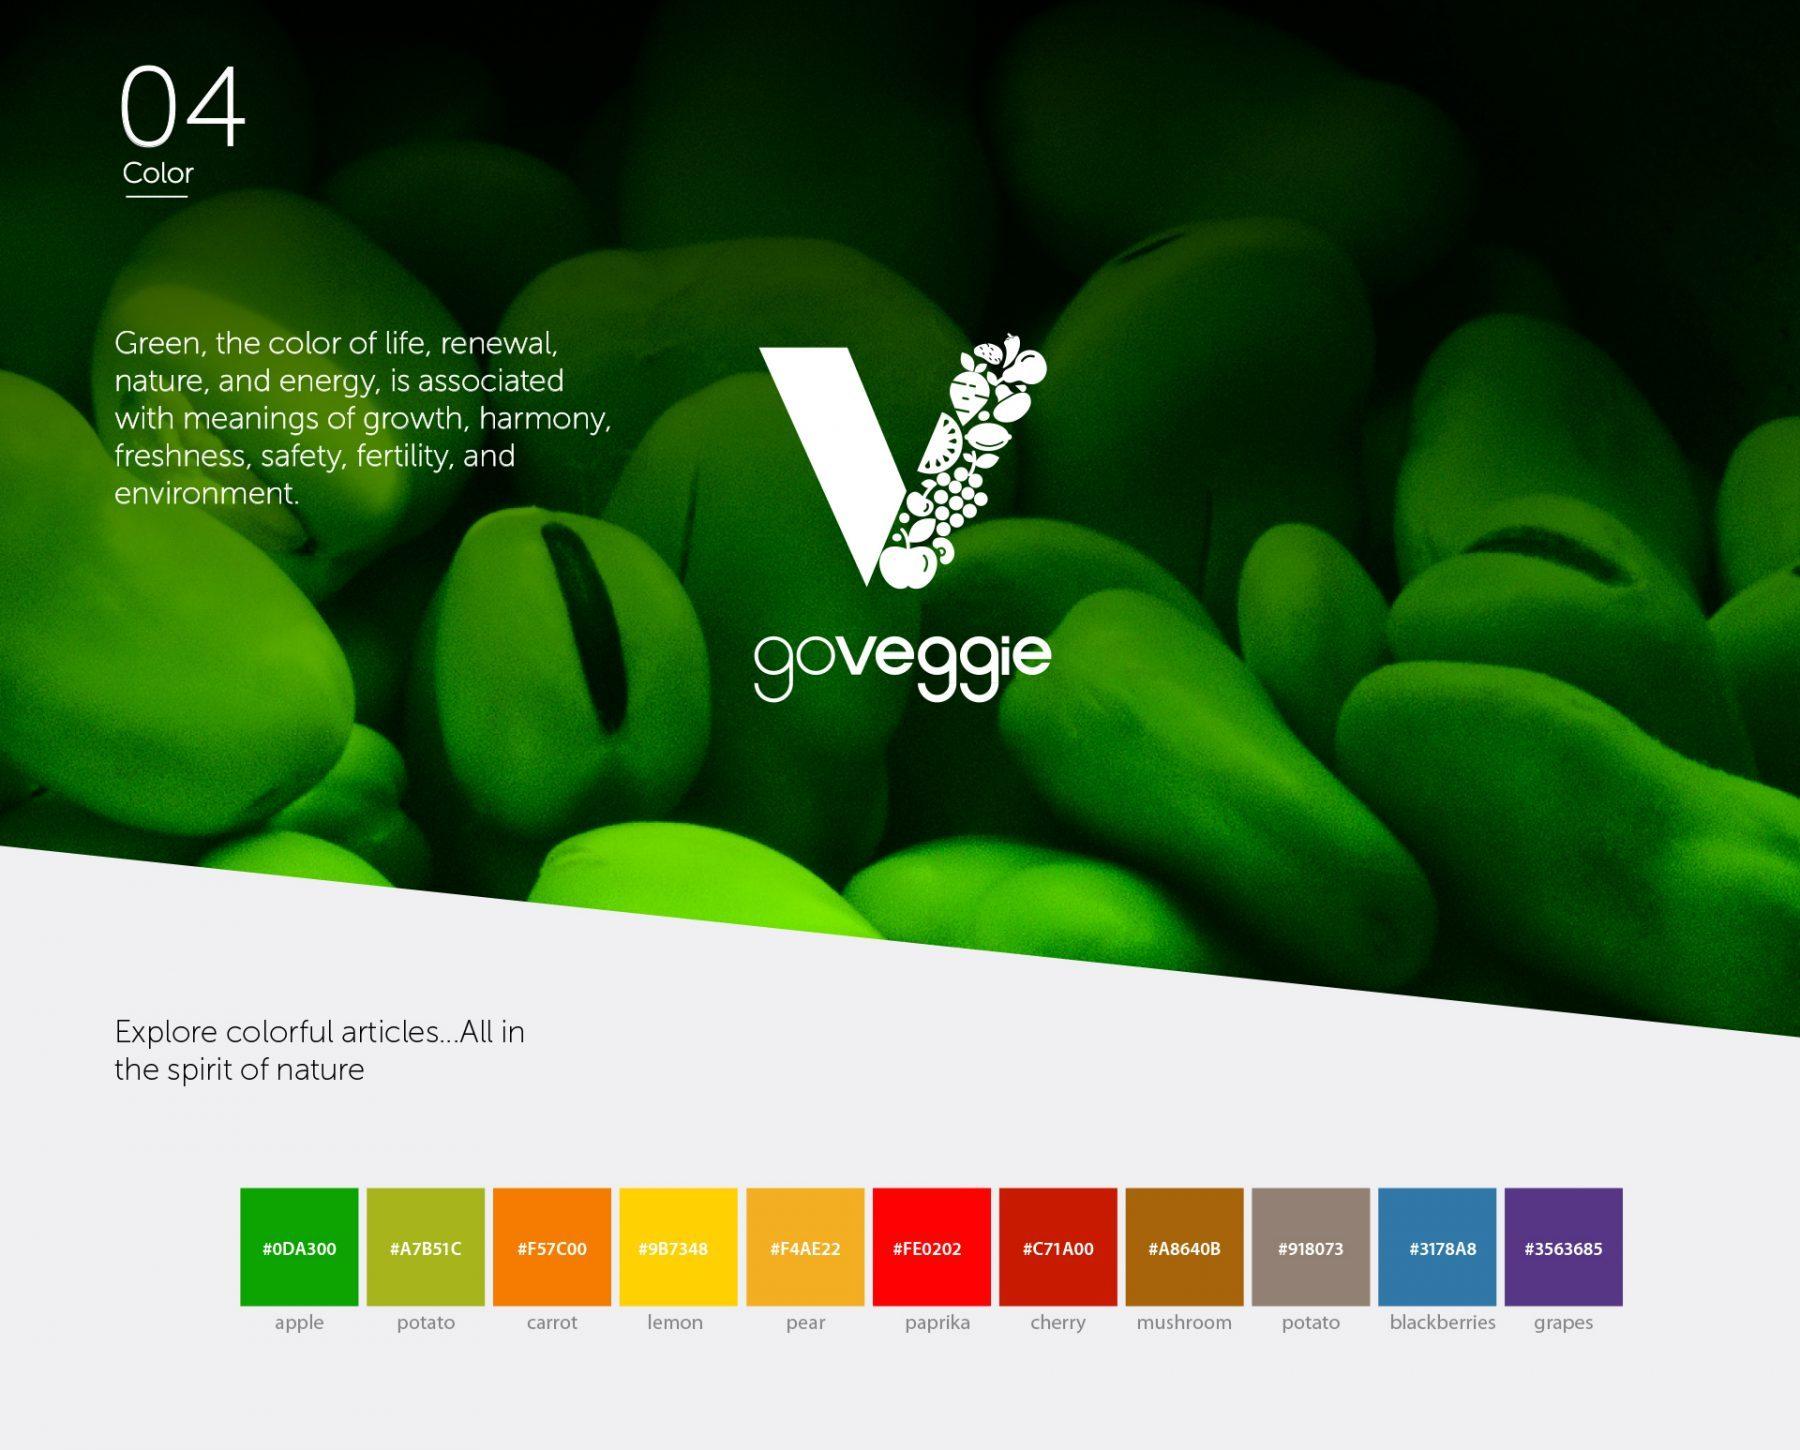 Go Veggie brand color palette